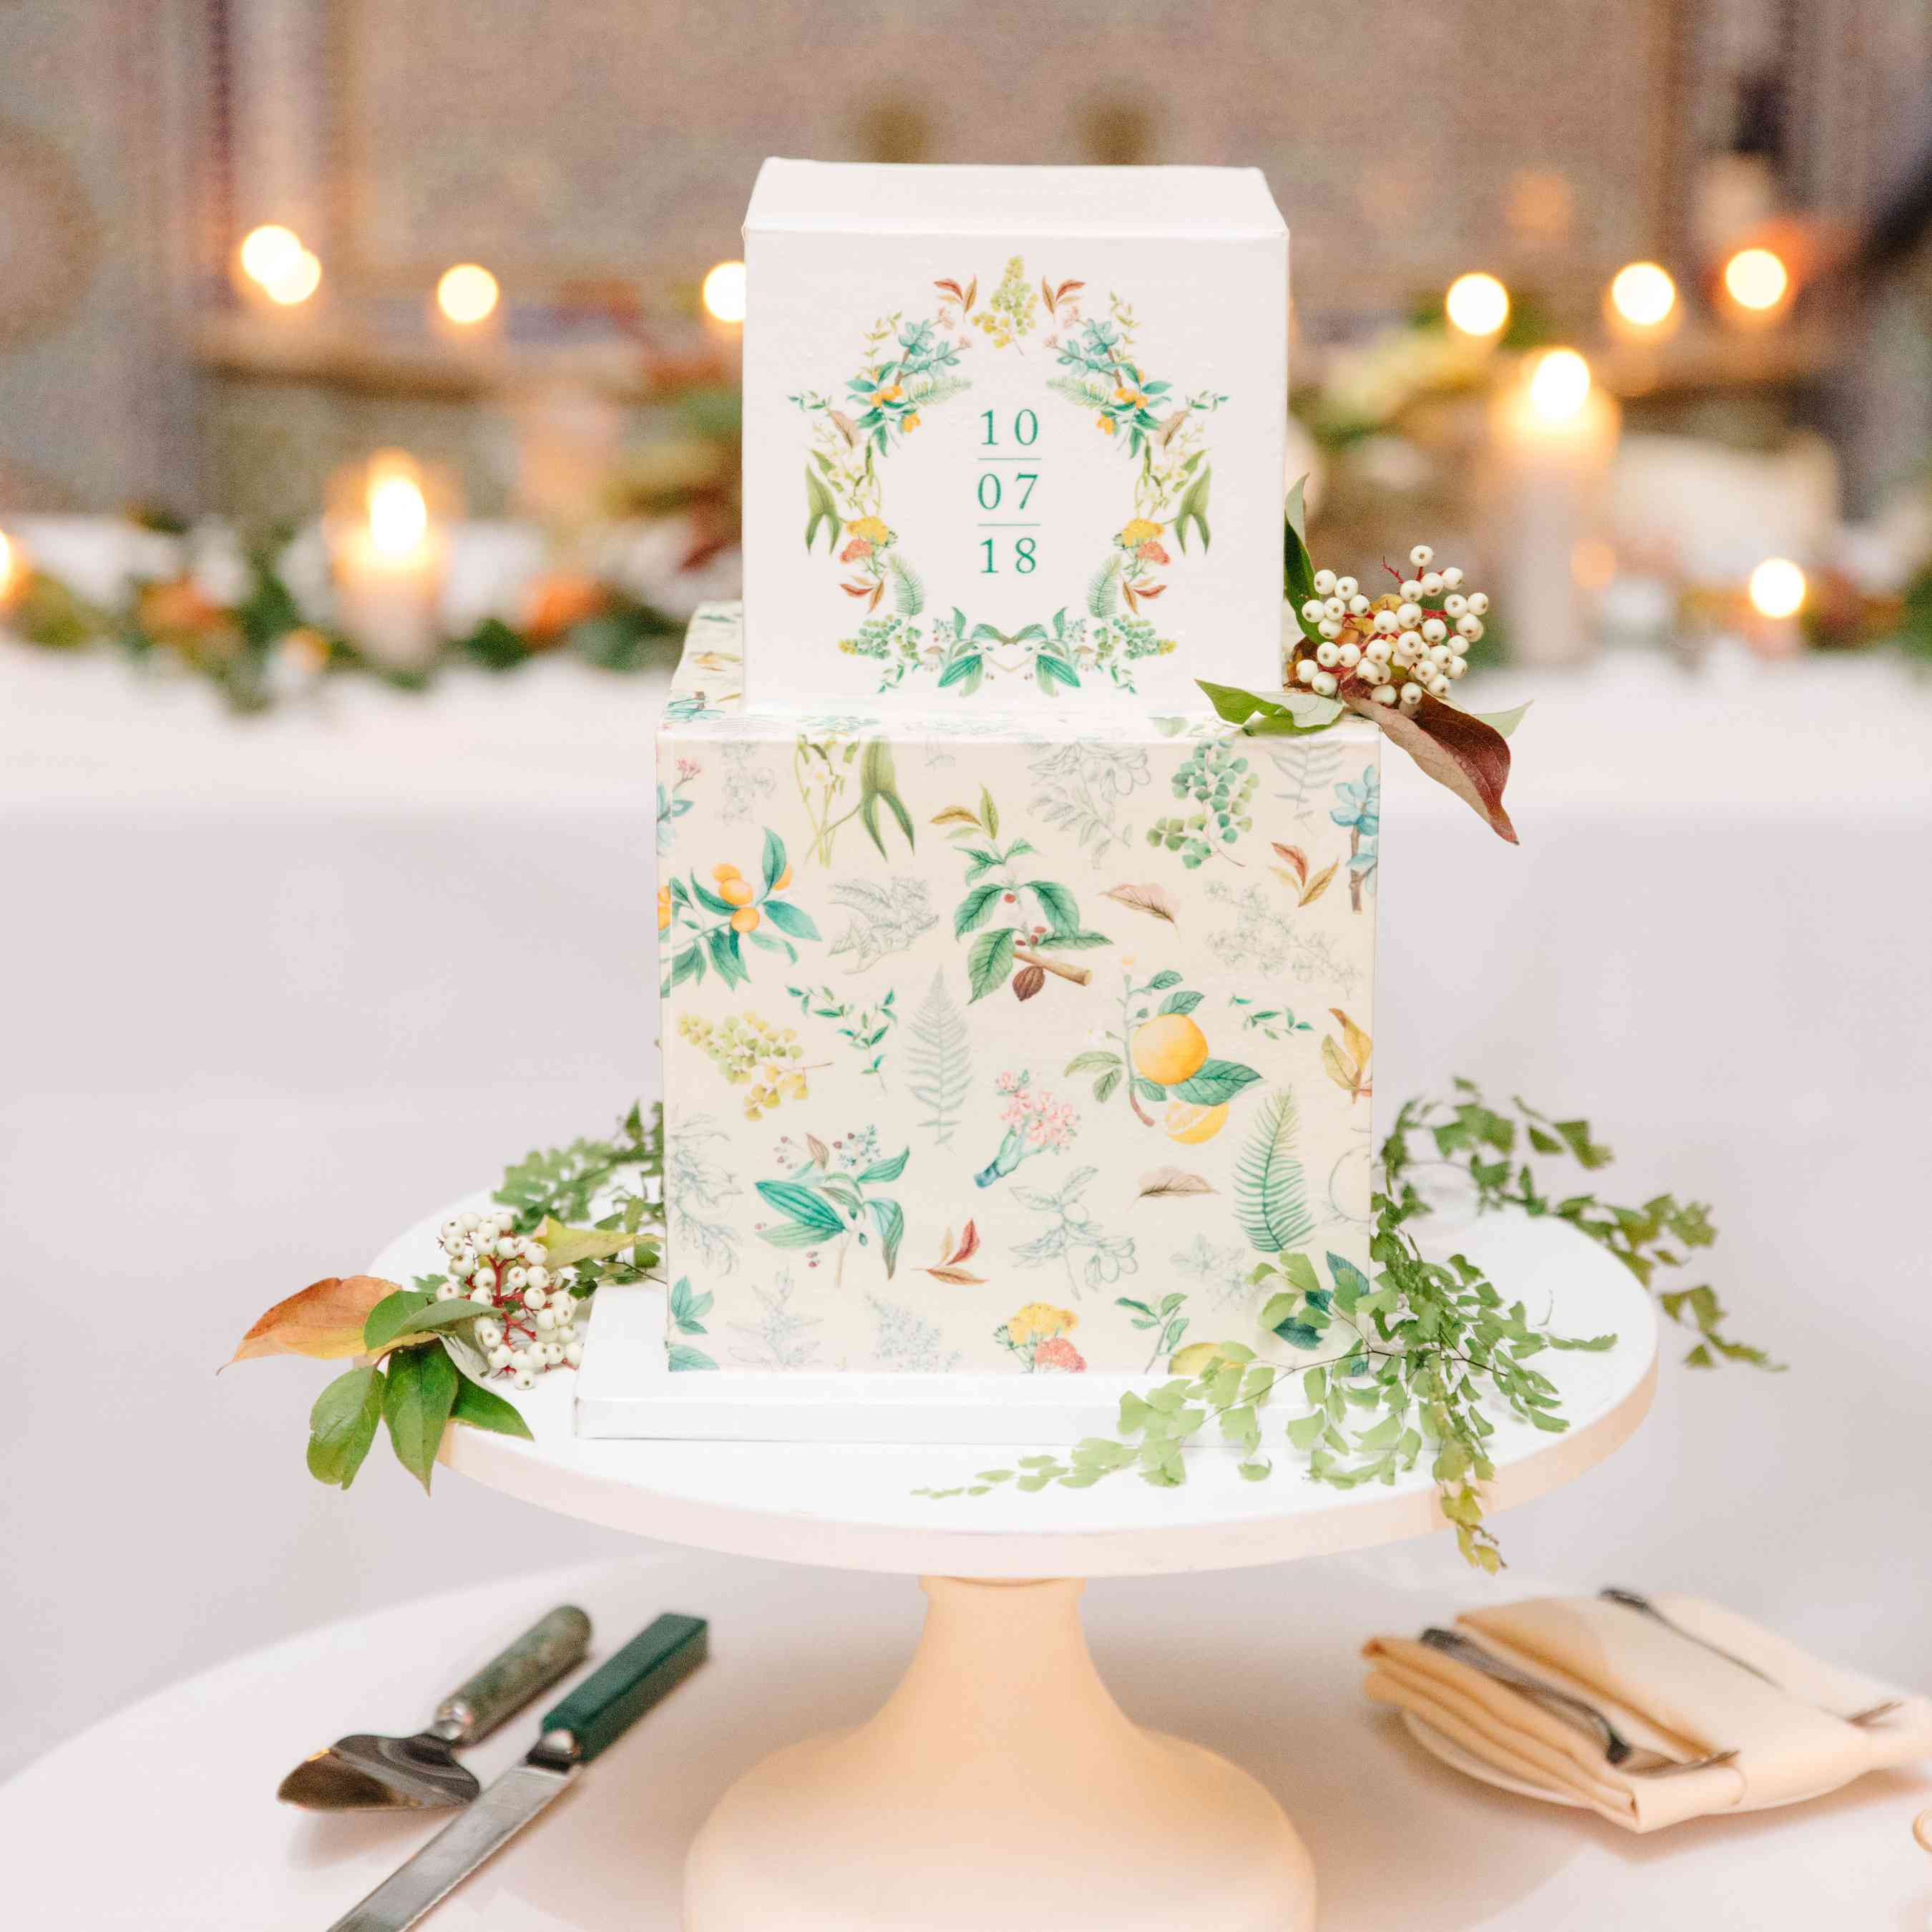 Cake Decorating Wedding Ideas: 10 Ways To Decorate A White Wedding Cake, So It's Anything